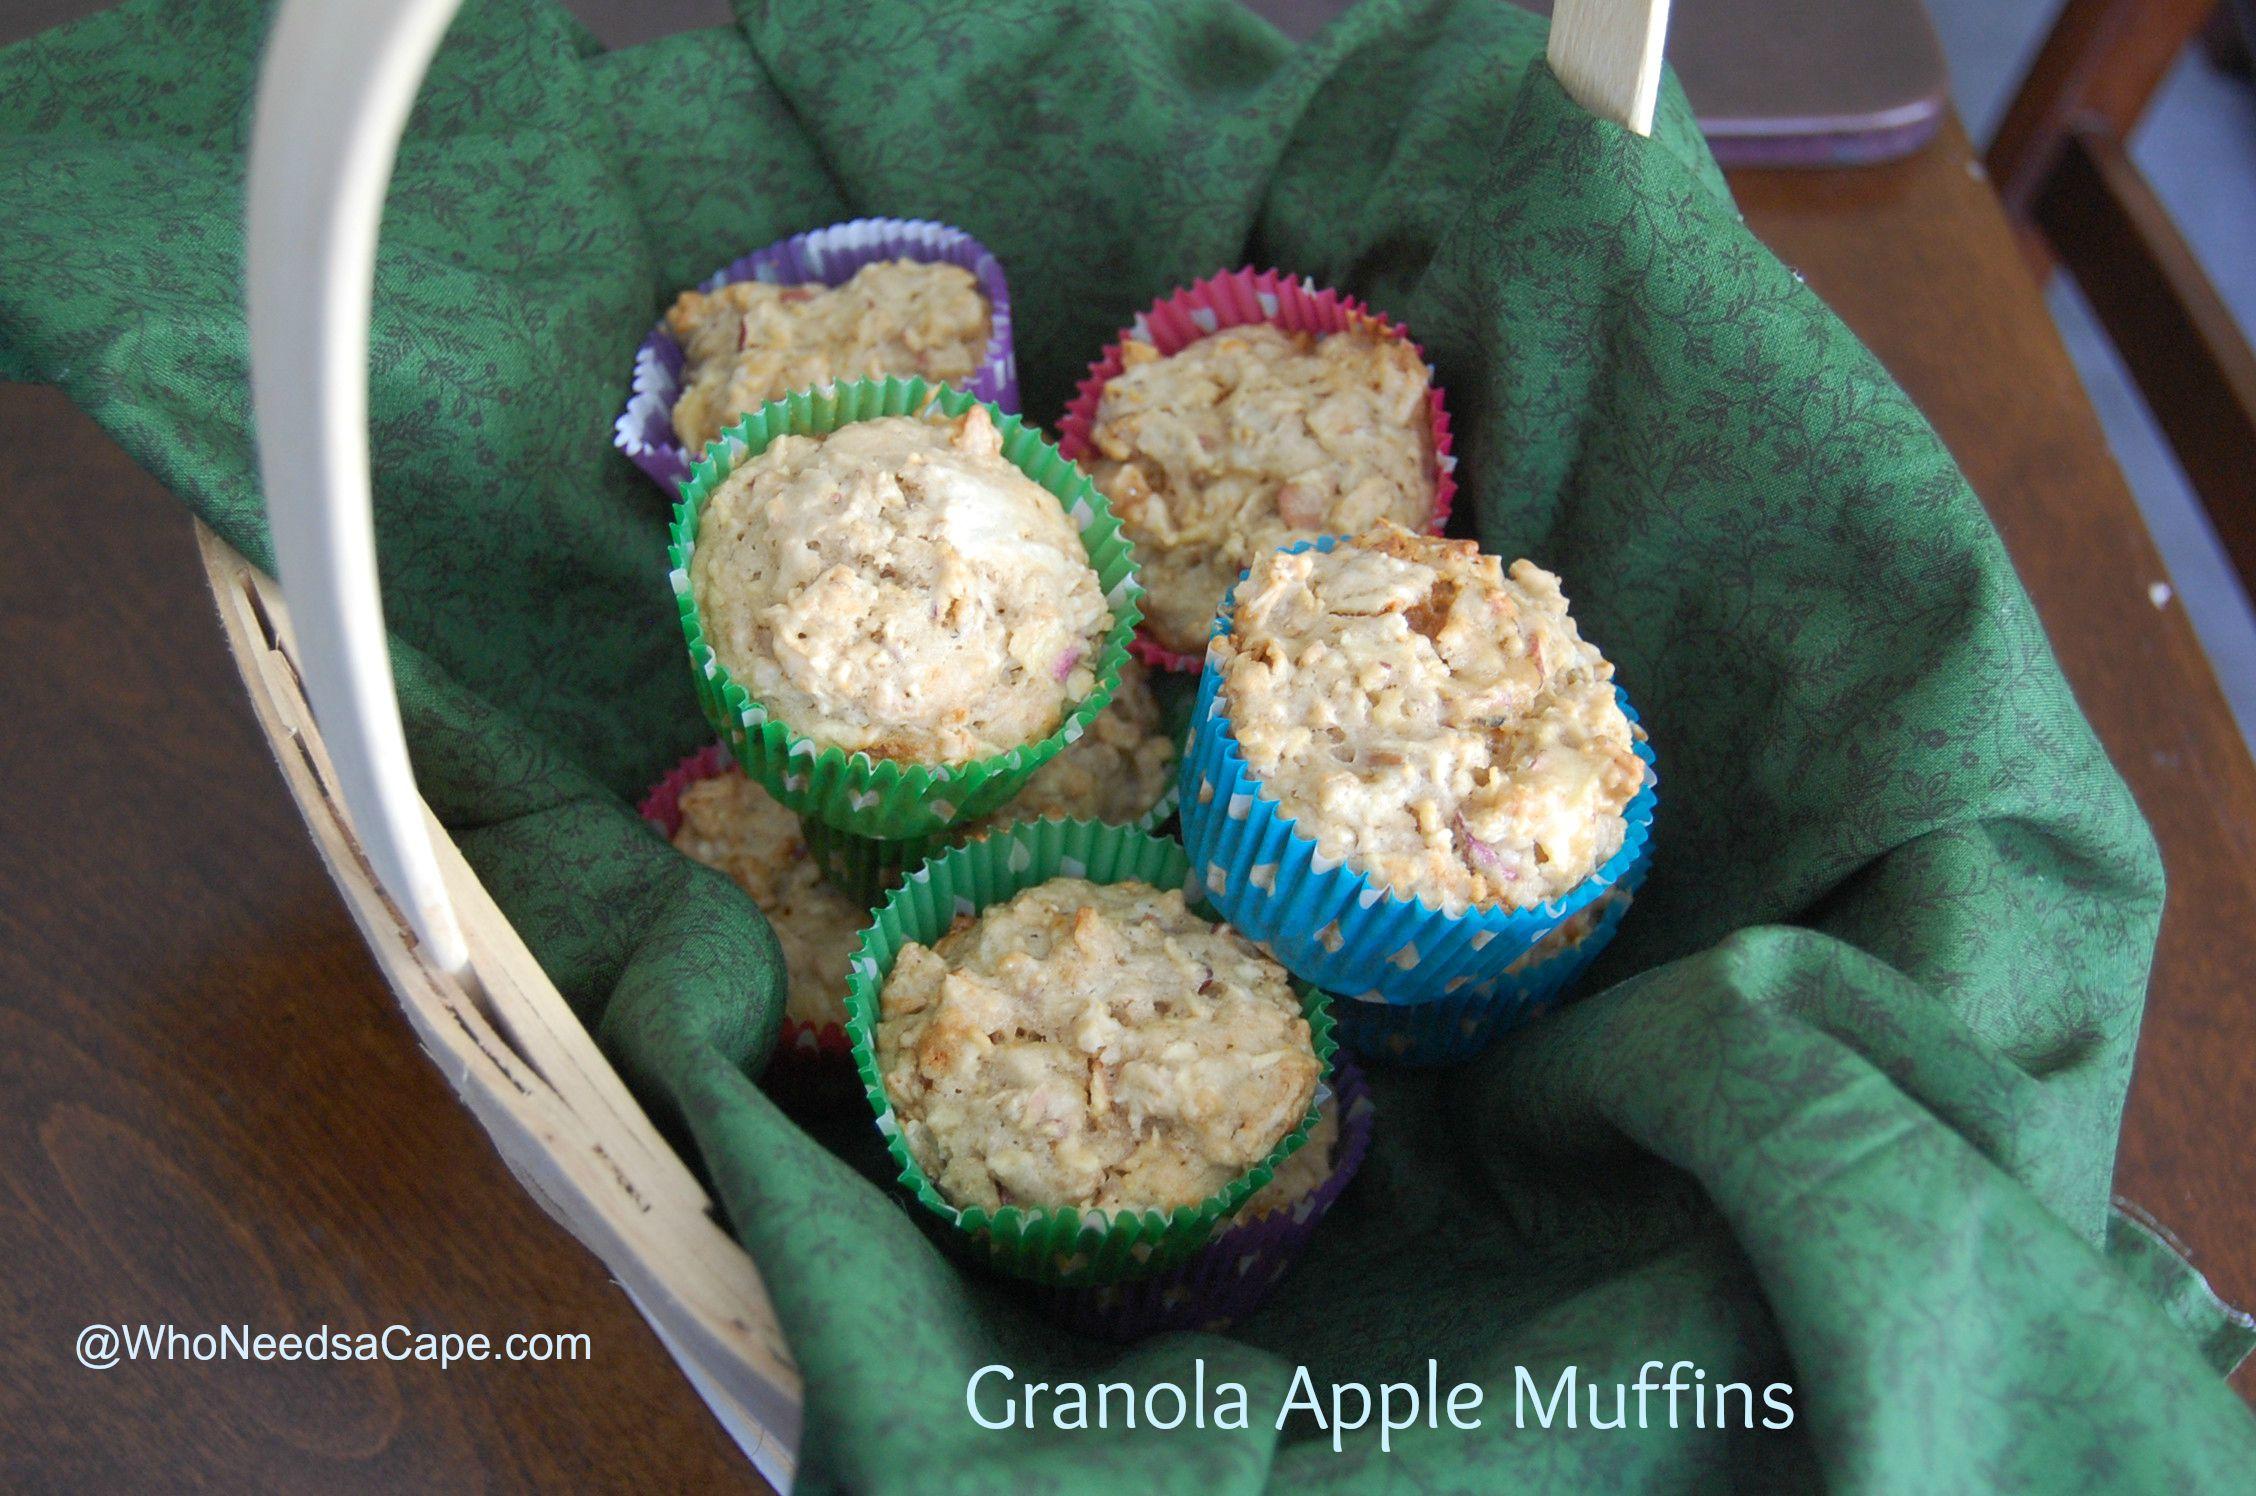 Granola Apple Muffins